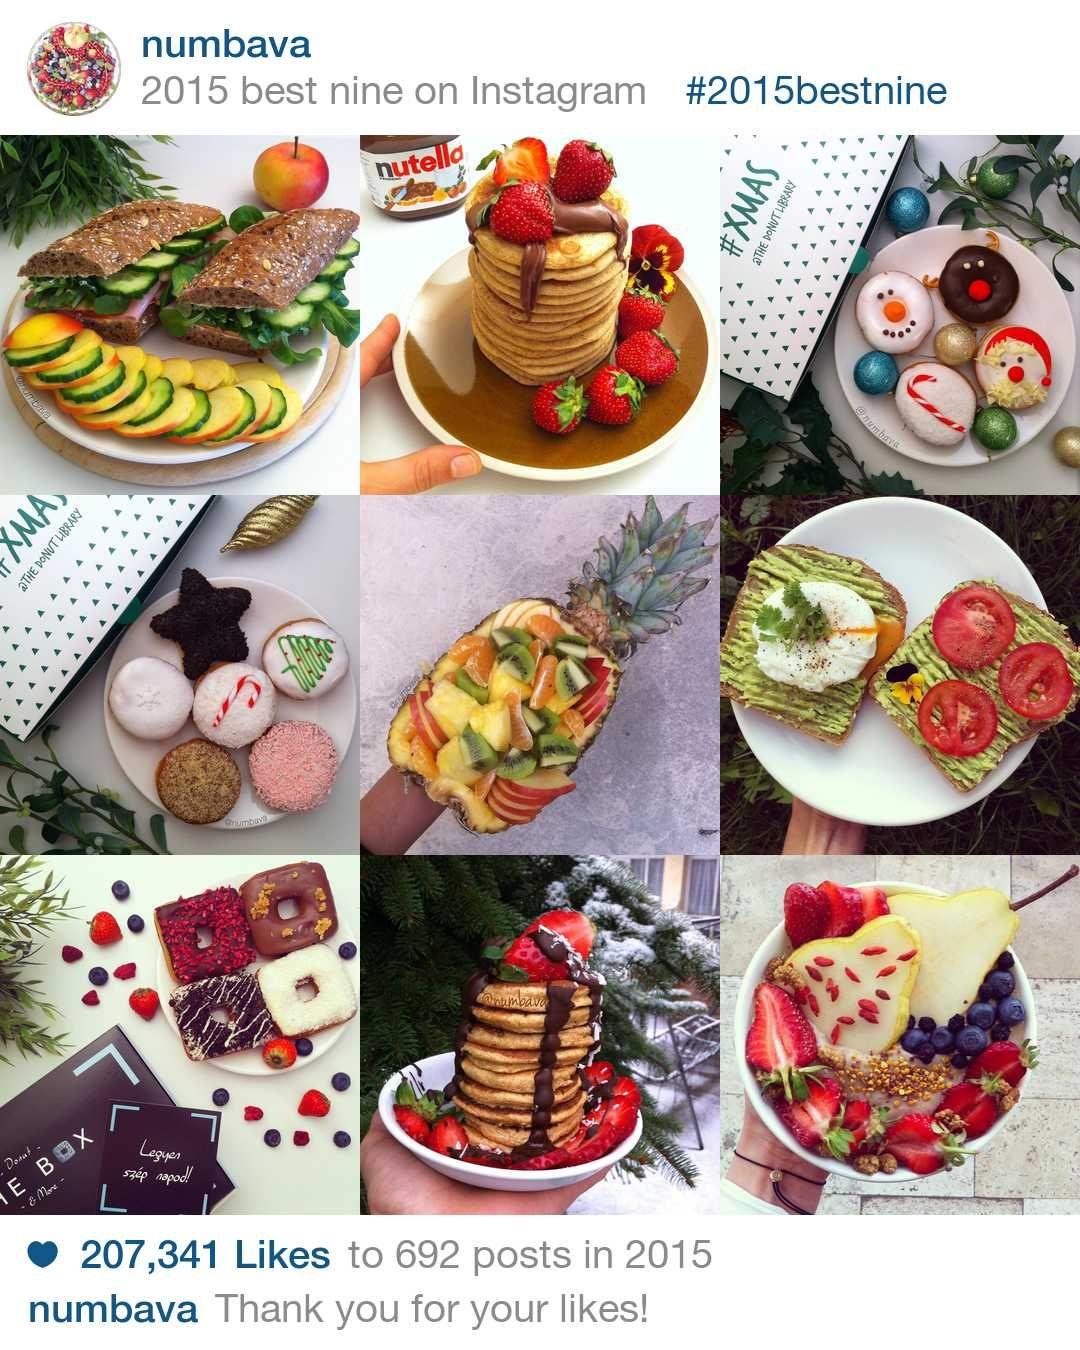 2015bestnine - numbava's best nine on Instagram in 2015